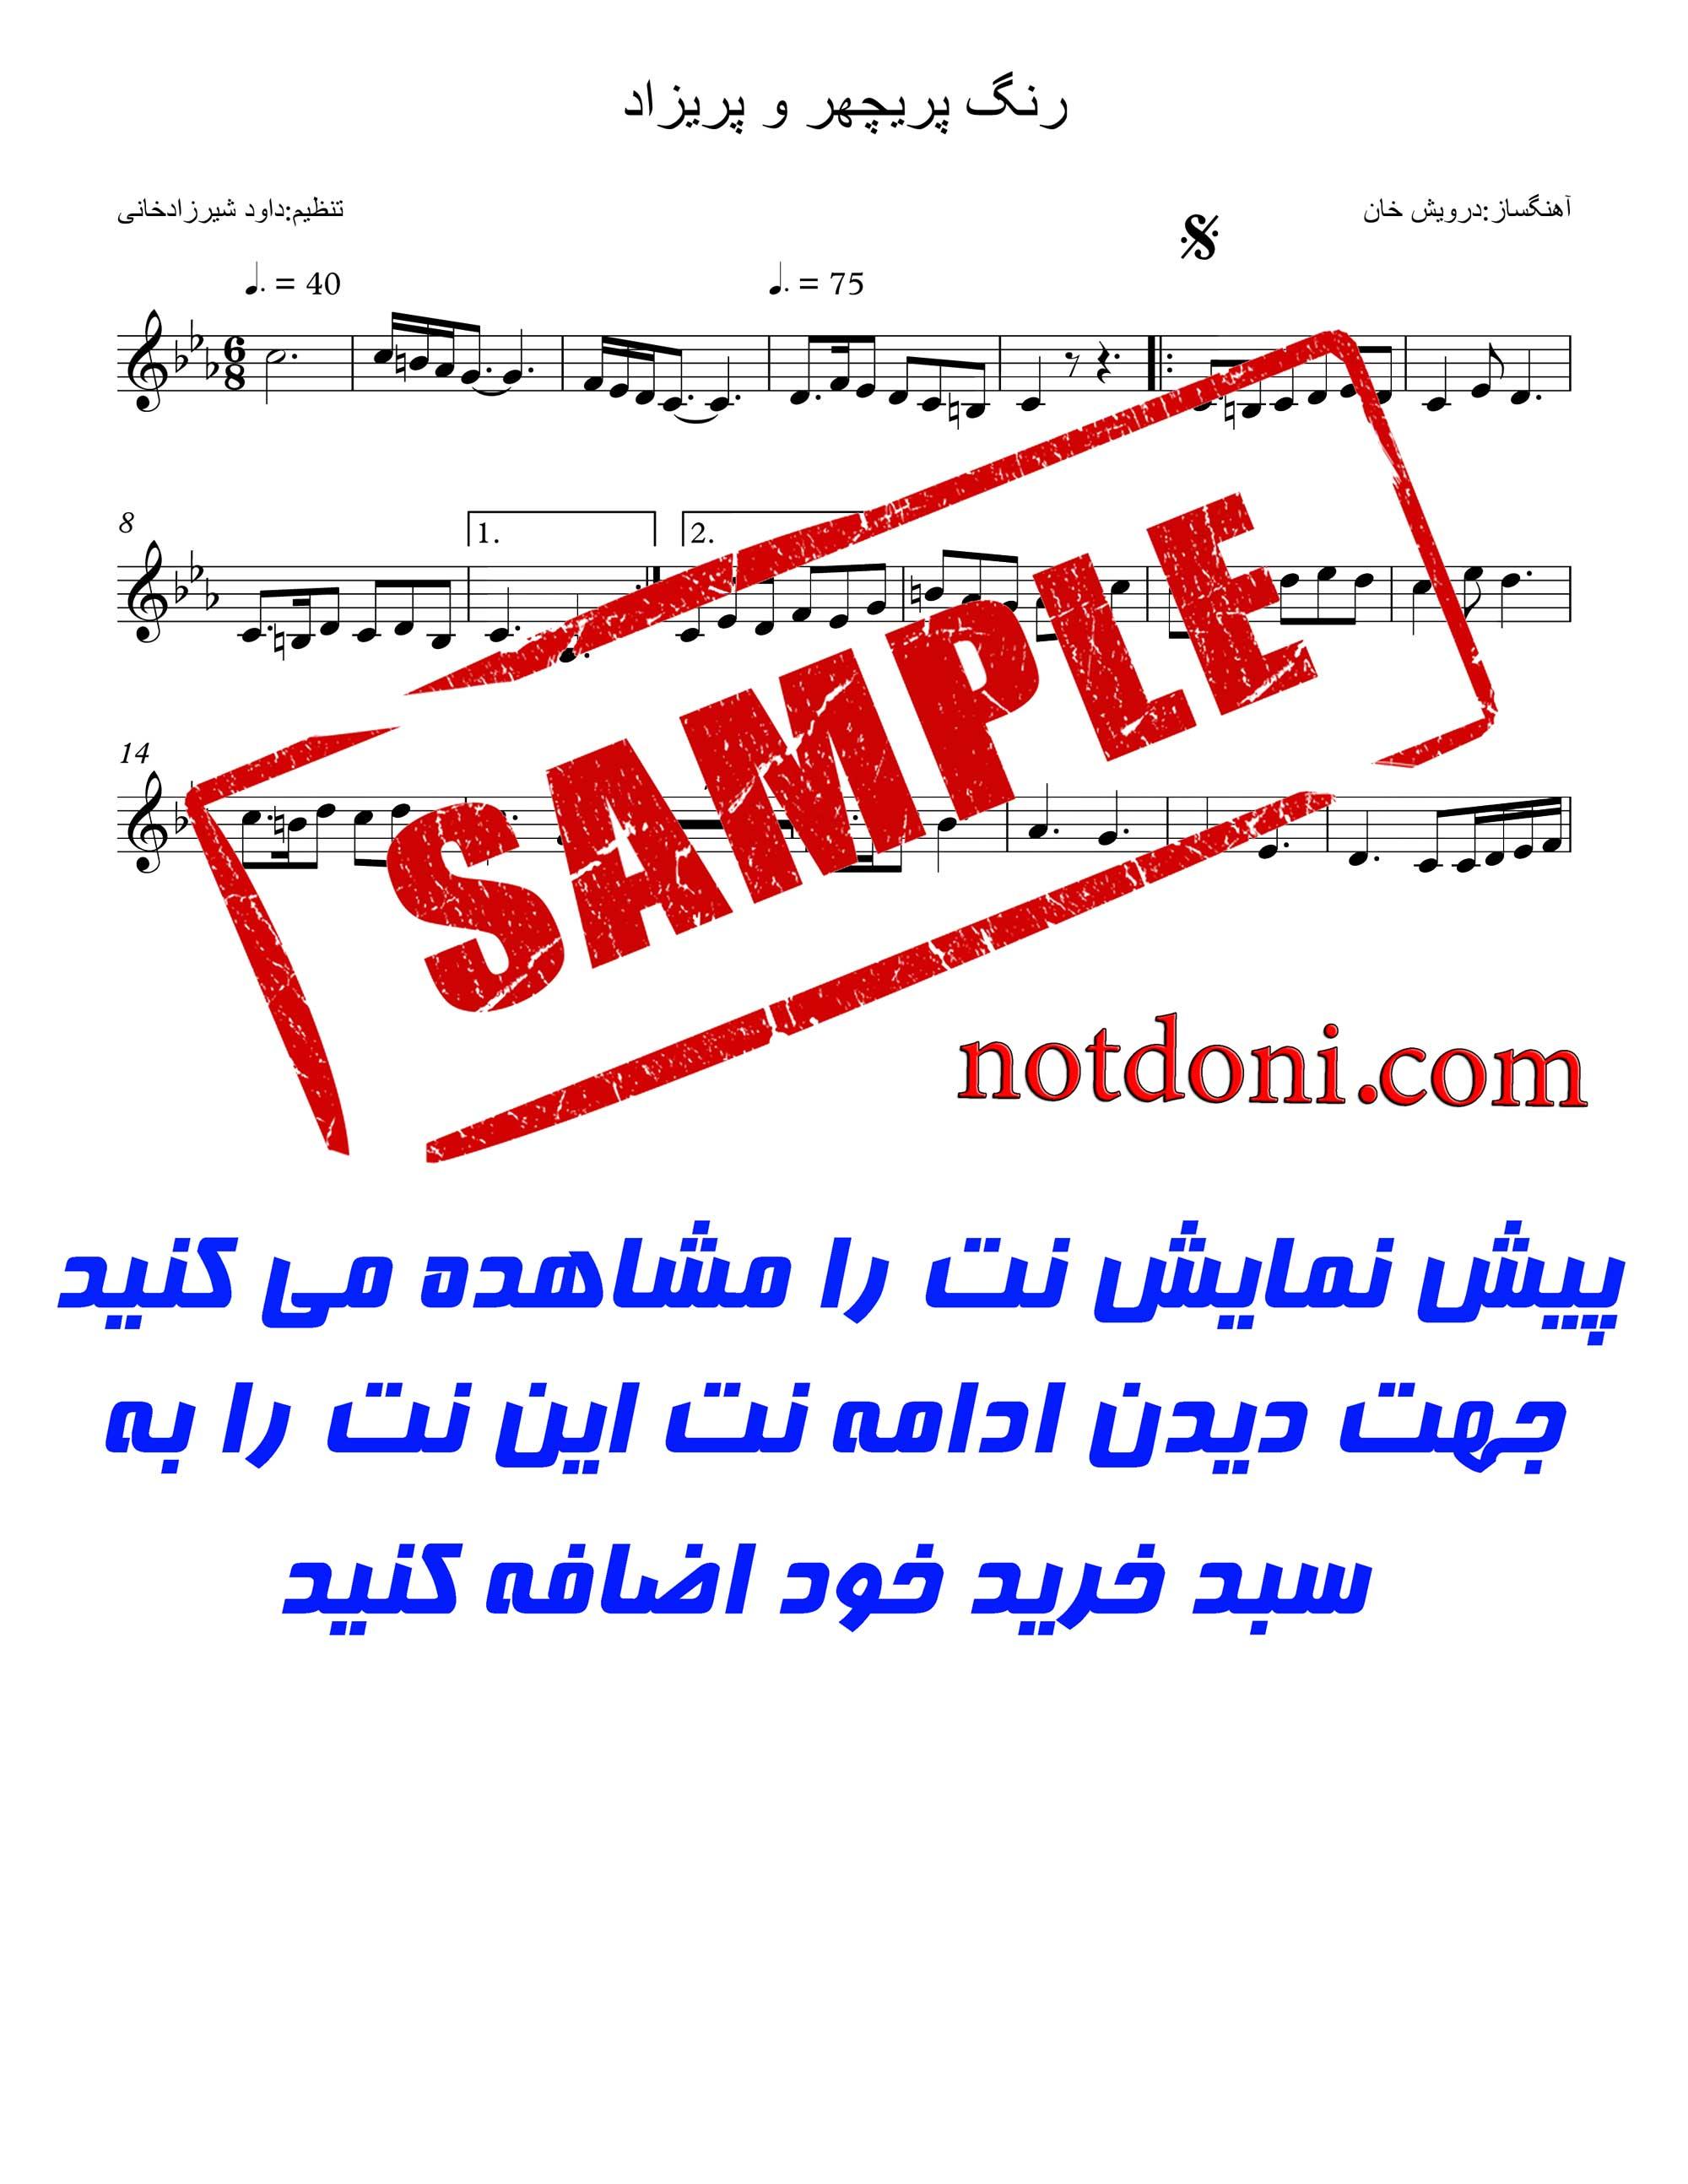 4575302f-1929-4391-89a7-a5ebe5f05572_دمو4.jpg